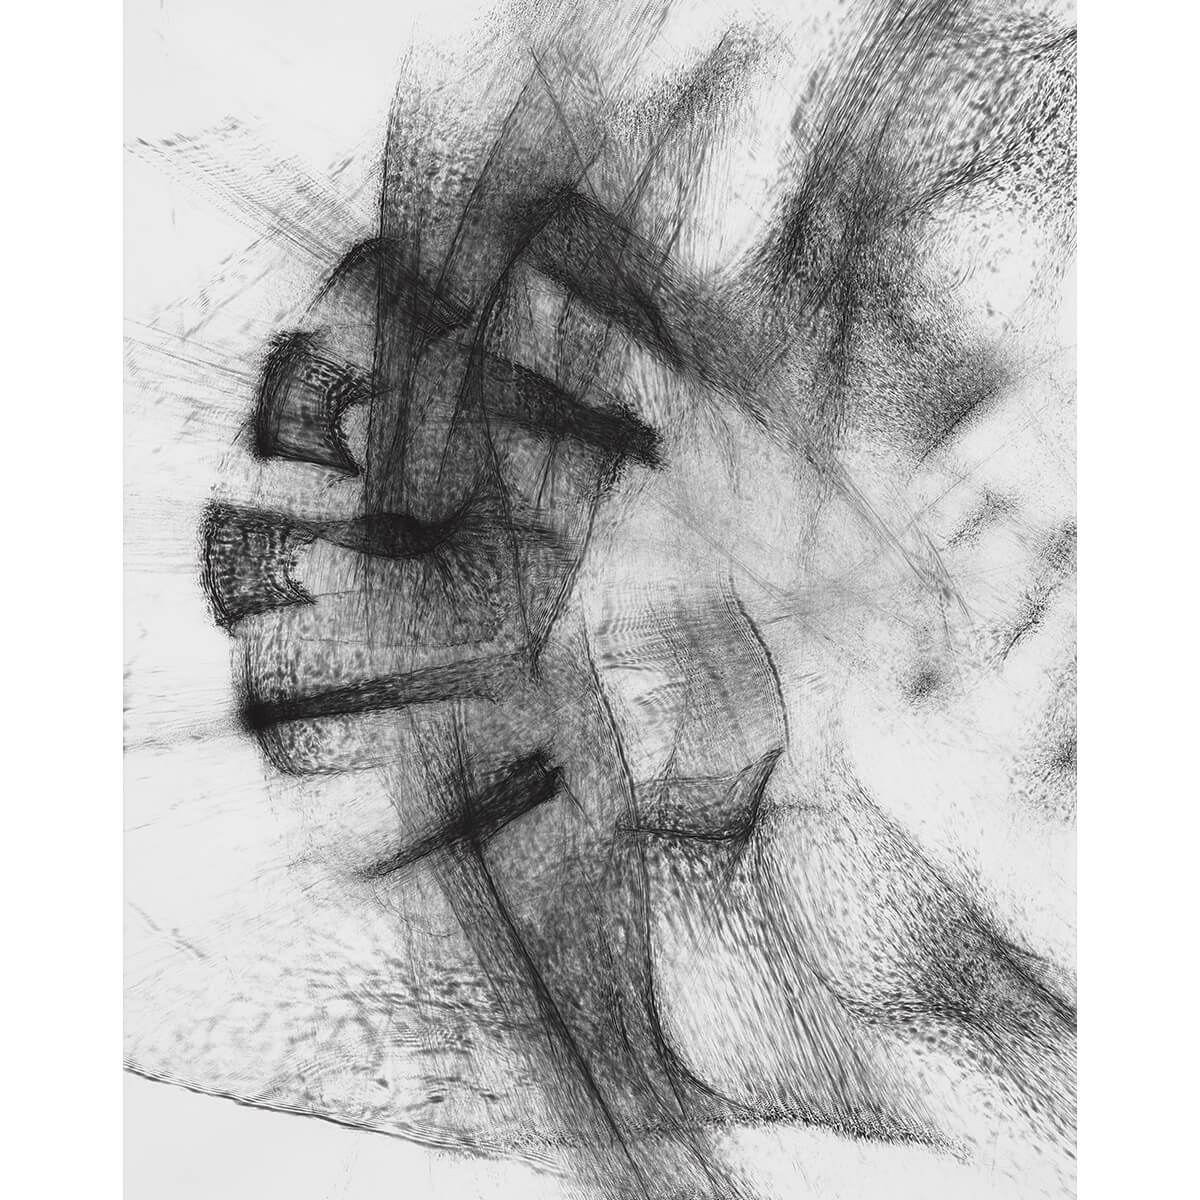 conrad shawcross